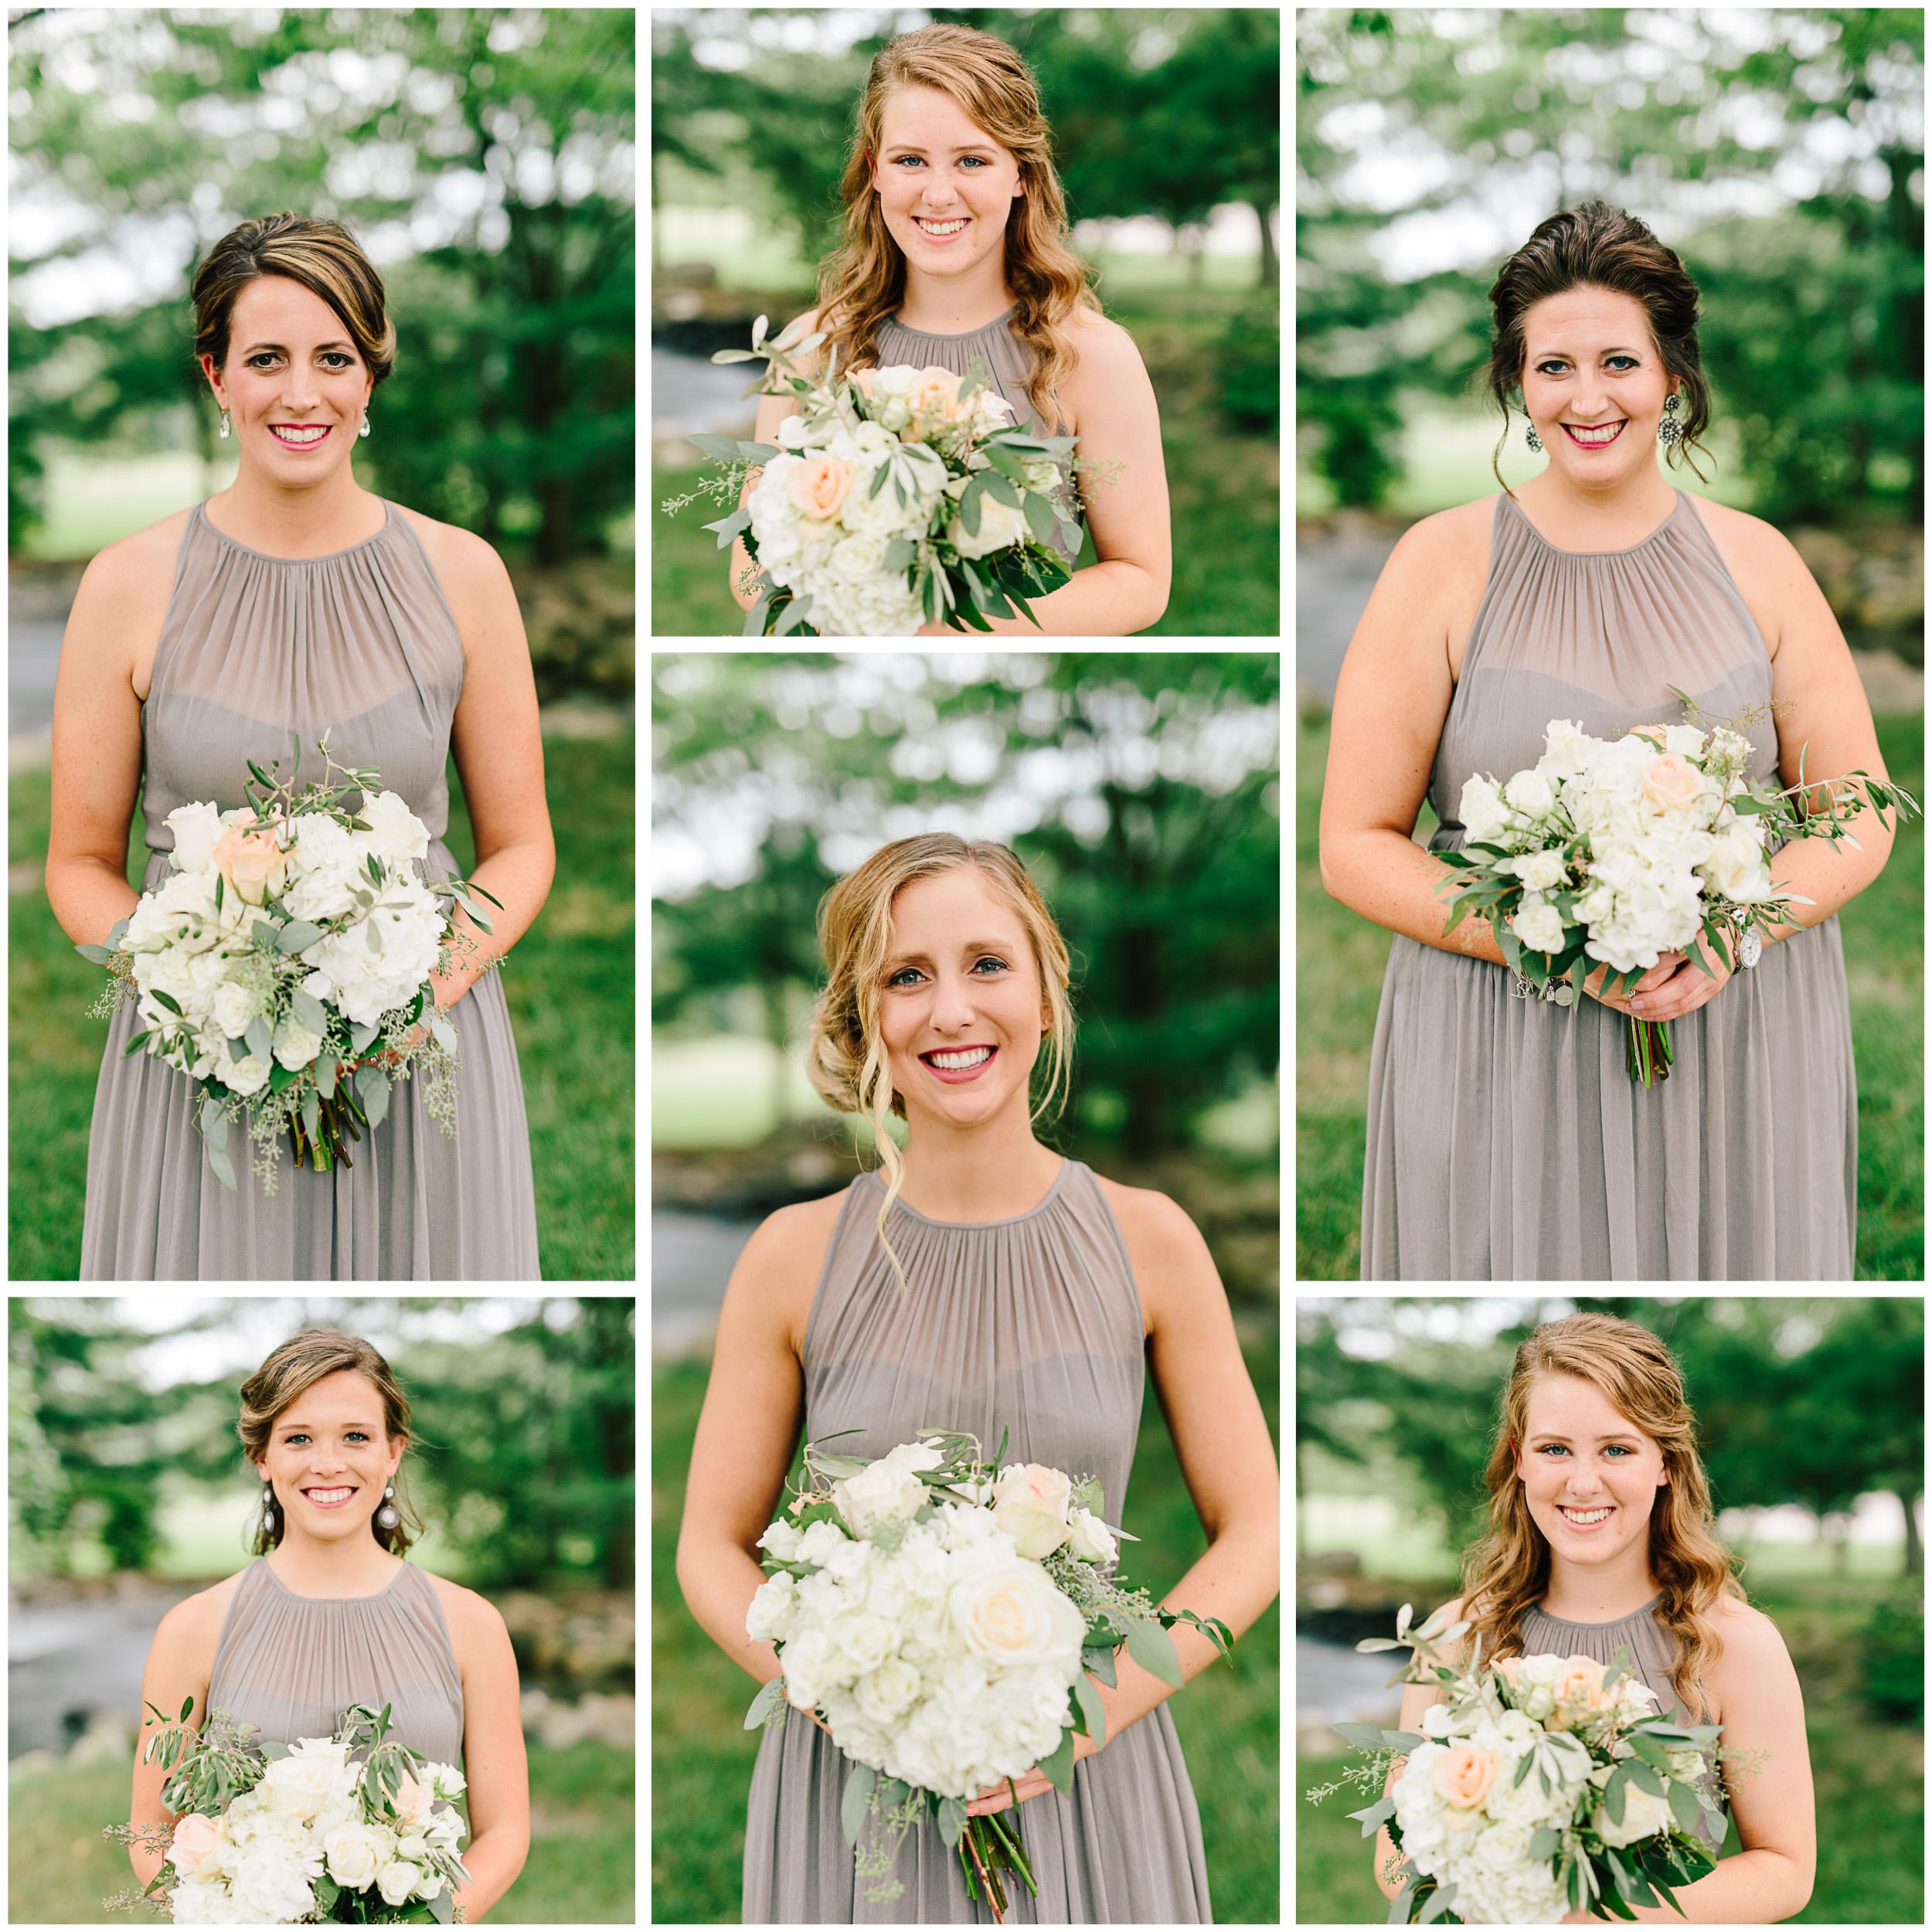 ann_arbor_michigan_wedding_57.jpg